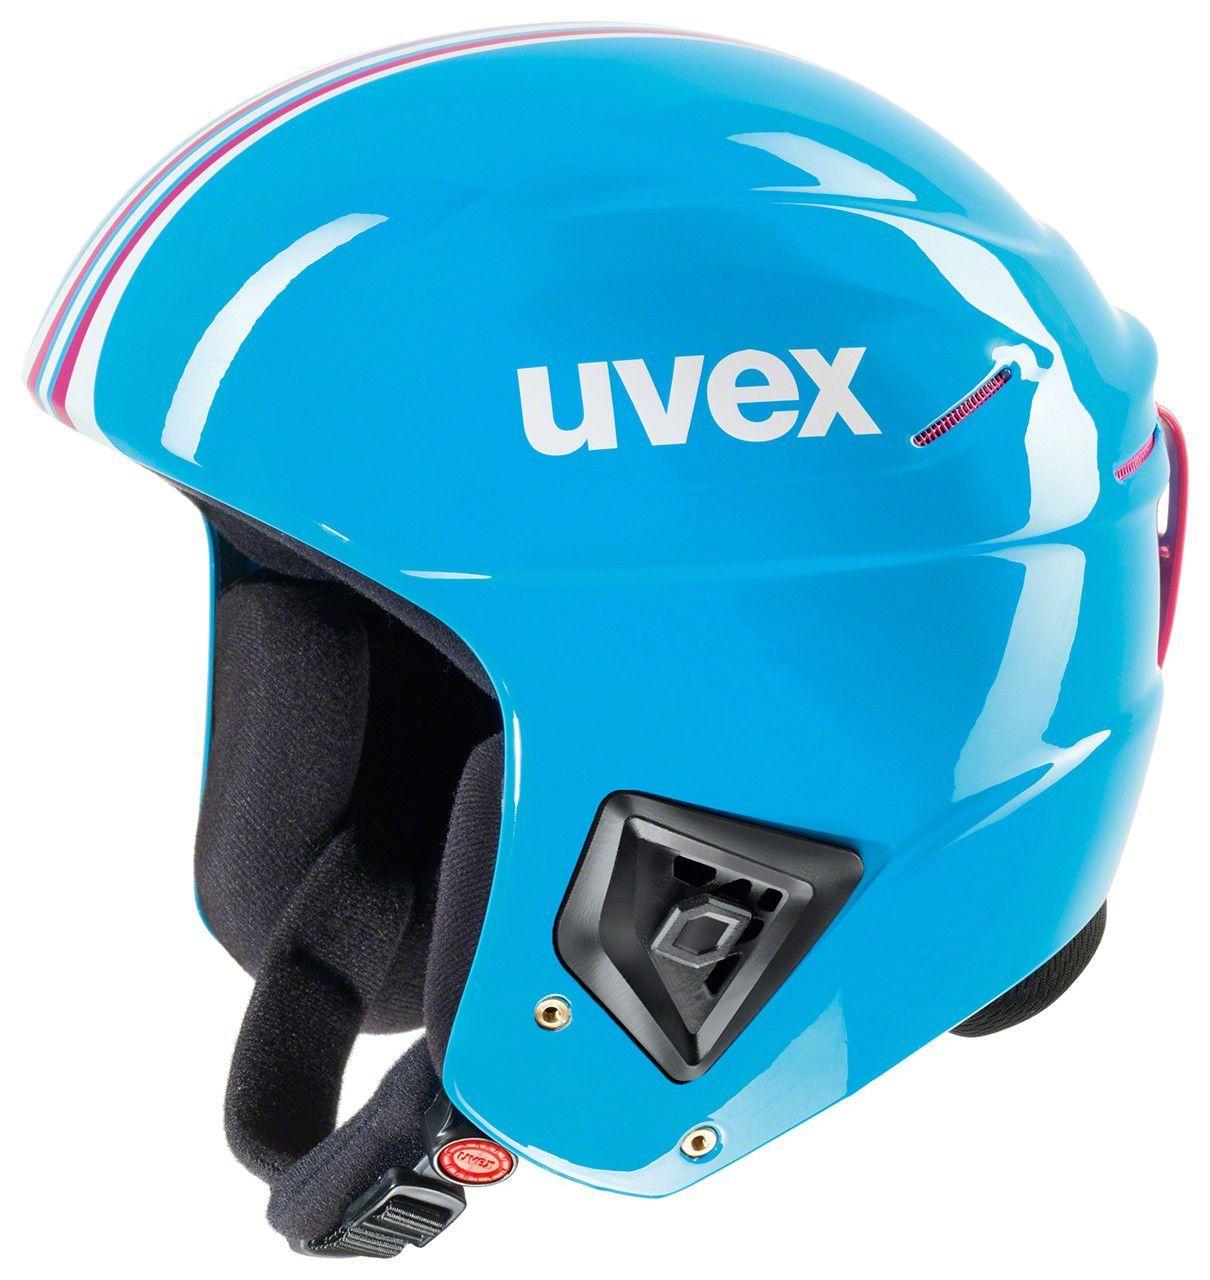 f8481b6628 Uvex Race Plus Helmet  Cyan-Pink